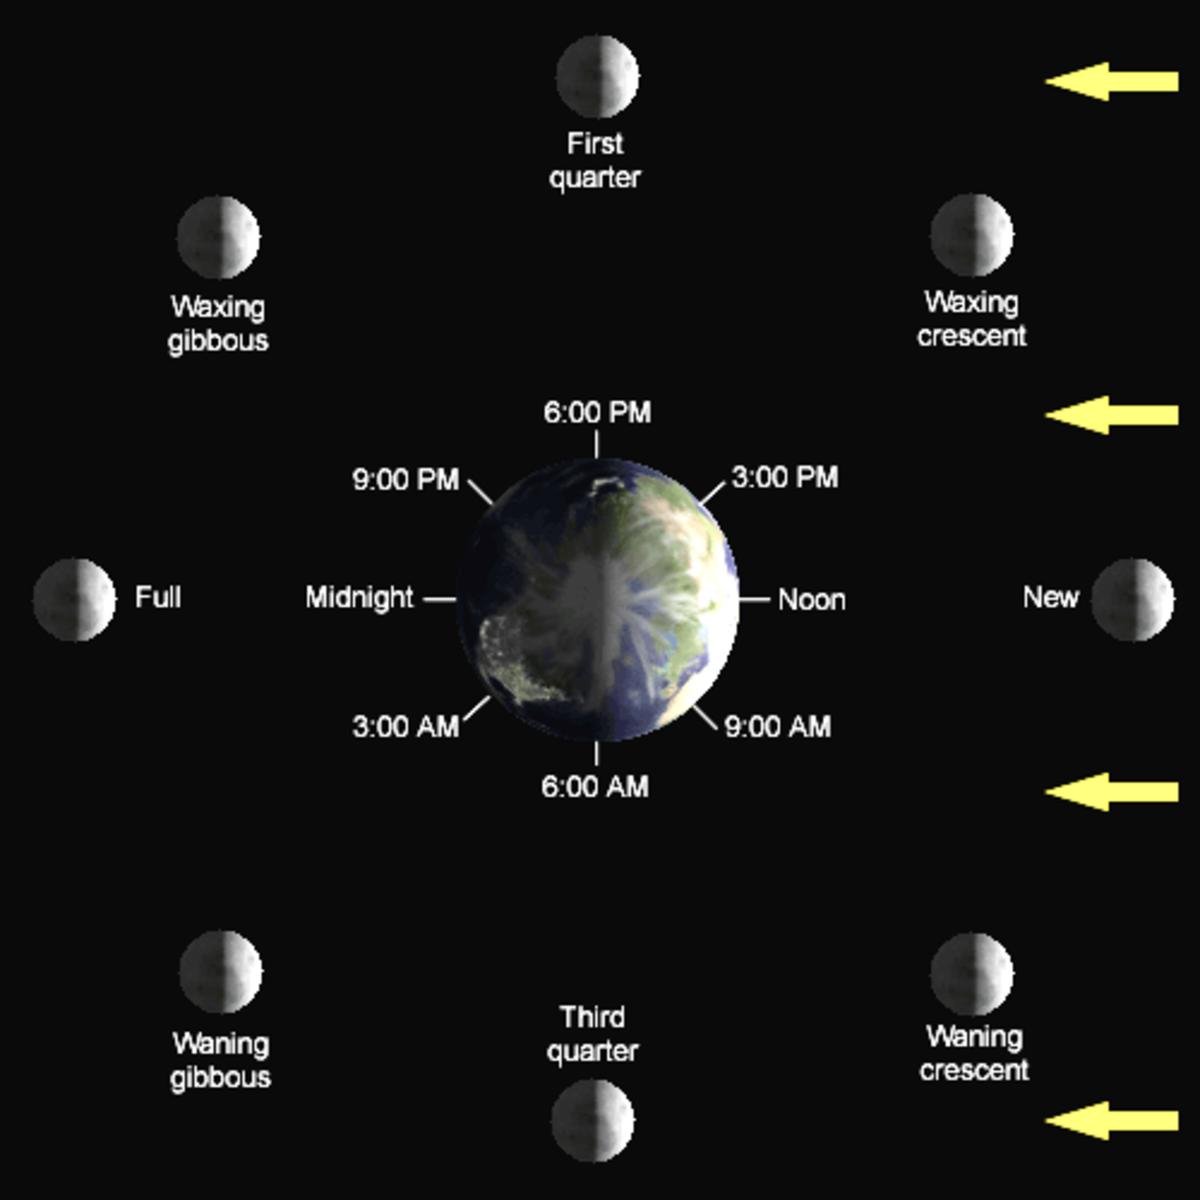 Diagram of lunar phases.